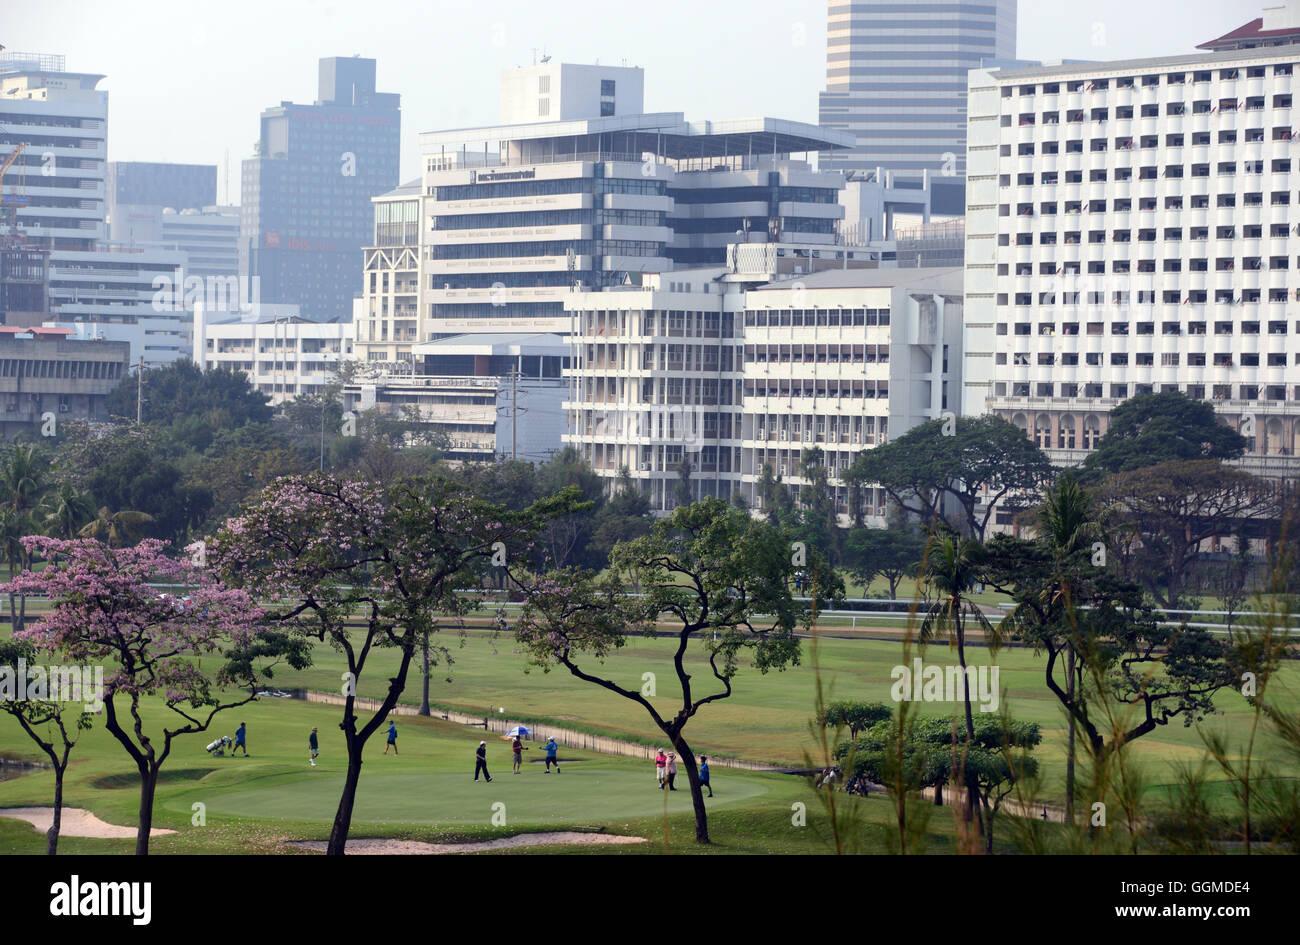 Golf course of the Royal Bangkok Sports Club, Bangkok, Thailand - Stock Image